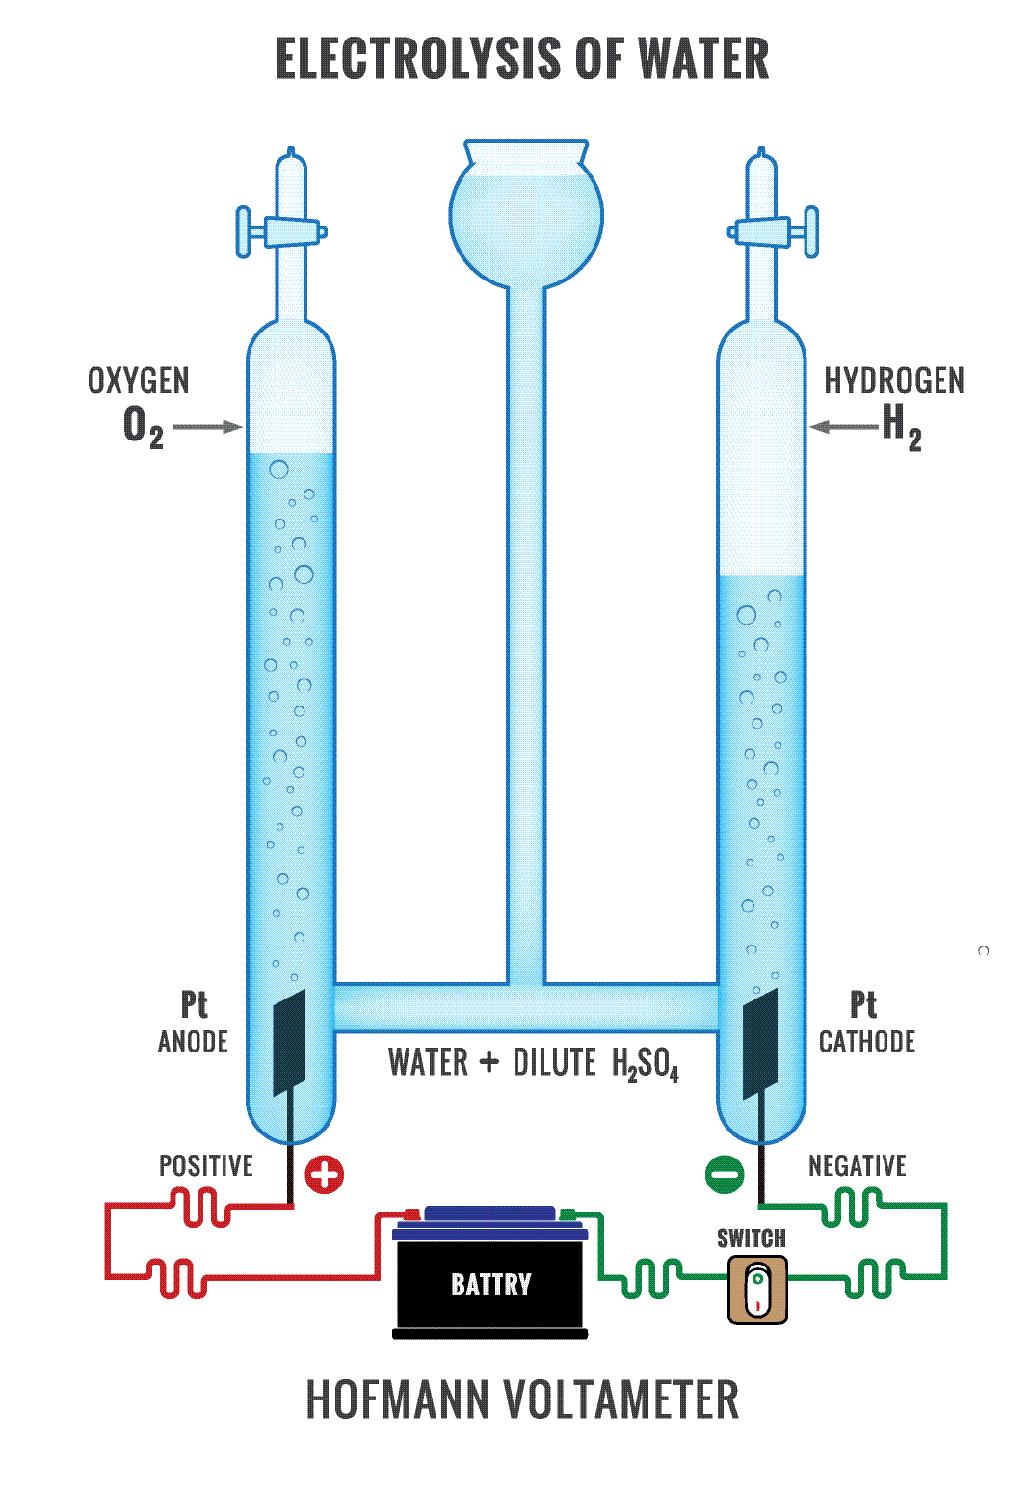 a diagram showing electrolysis